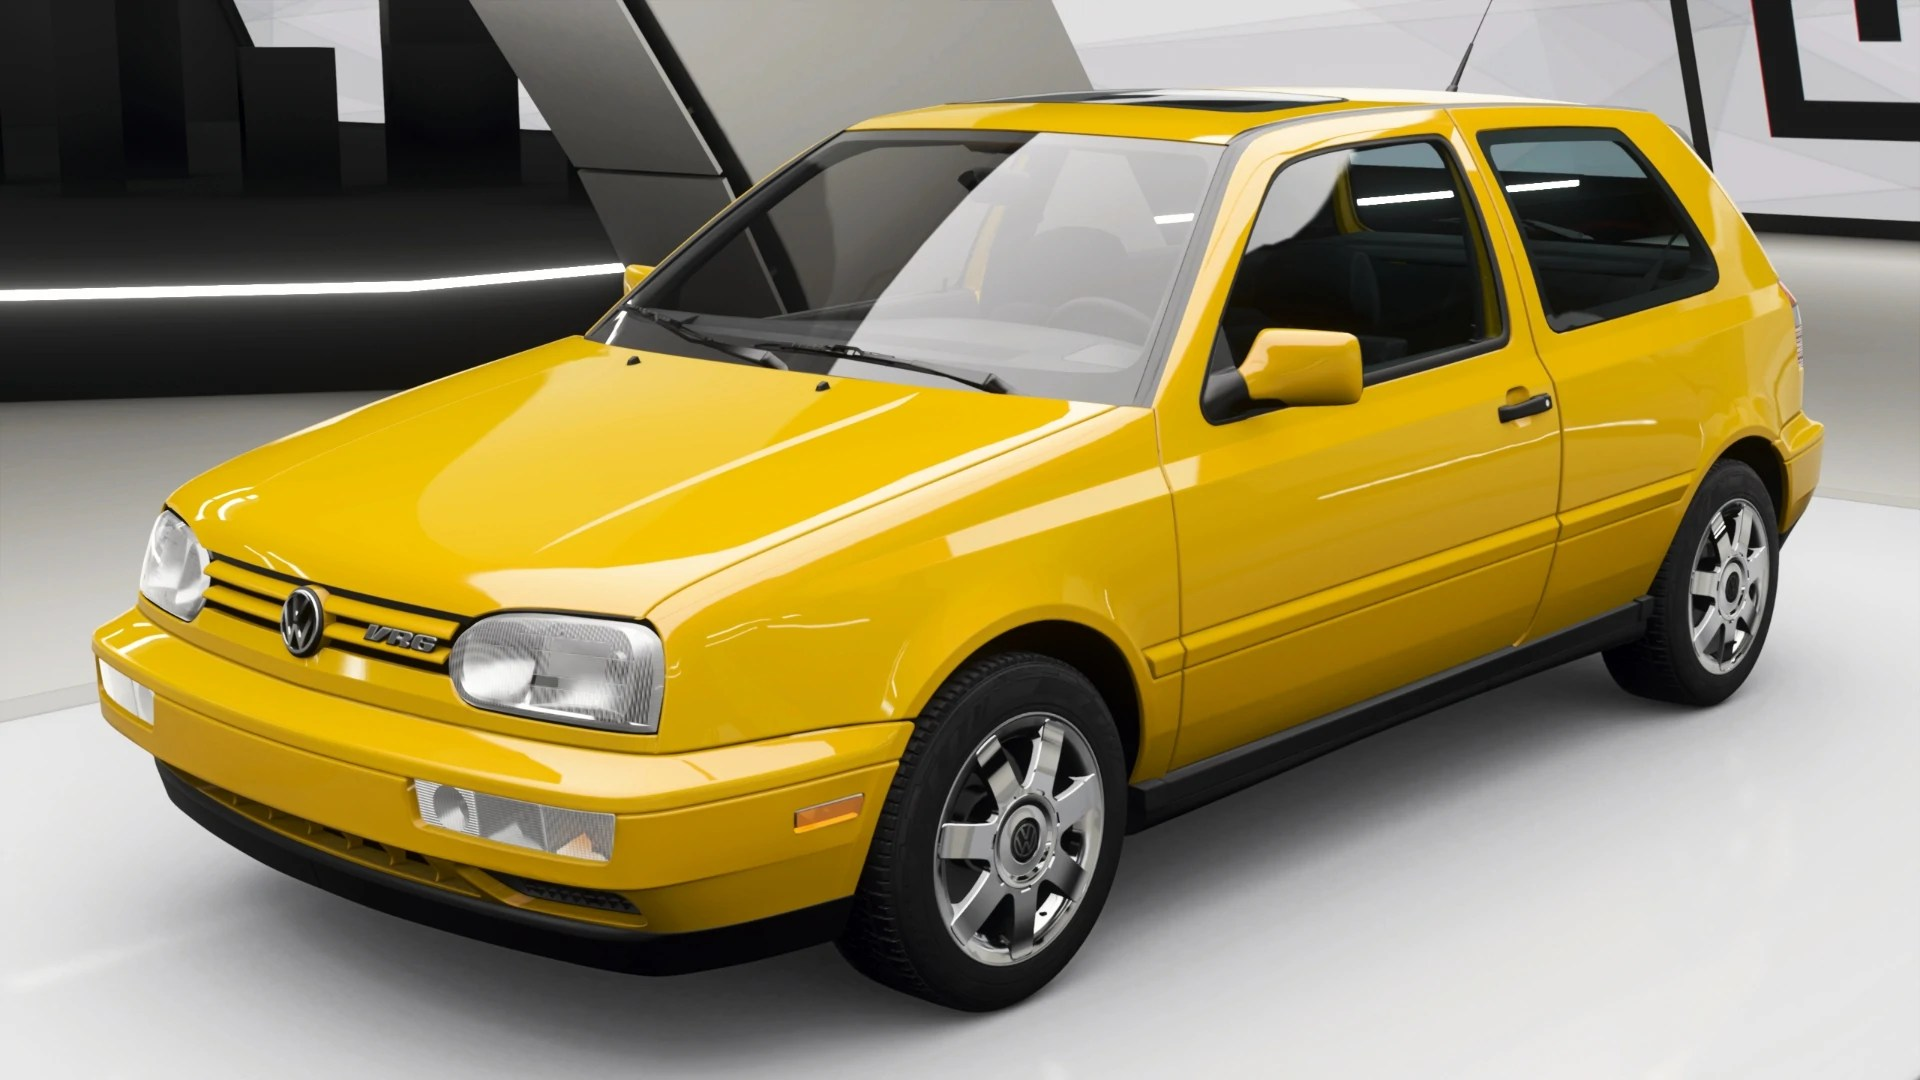 1998 volkswagen gti vr6 mk3 in forza horizon 4 [ 1920 x 1080 Pixel ]